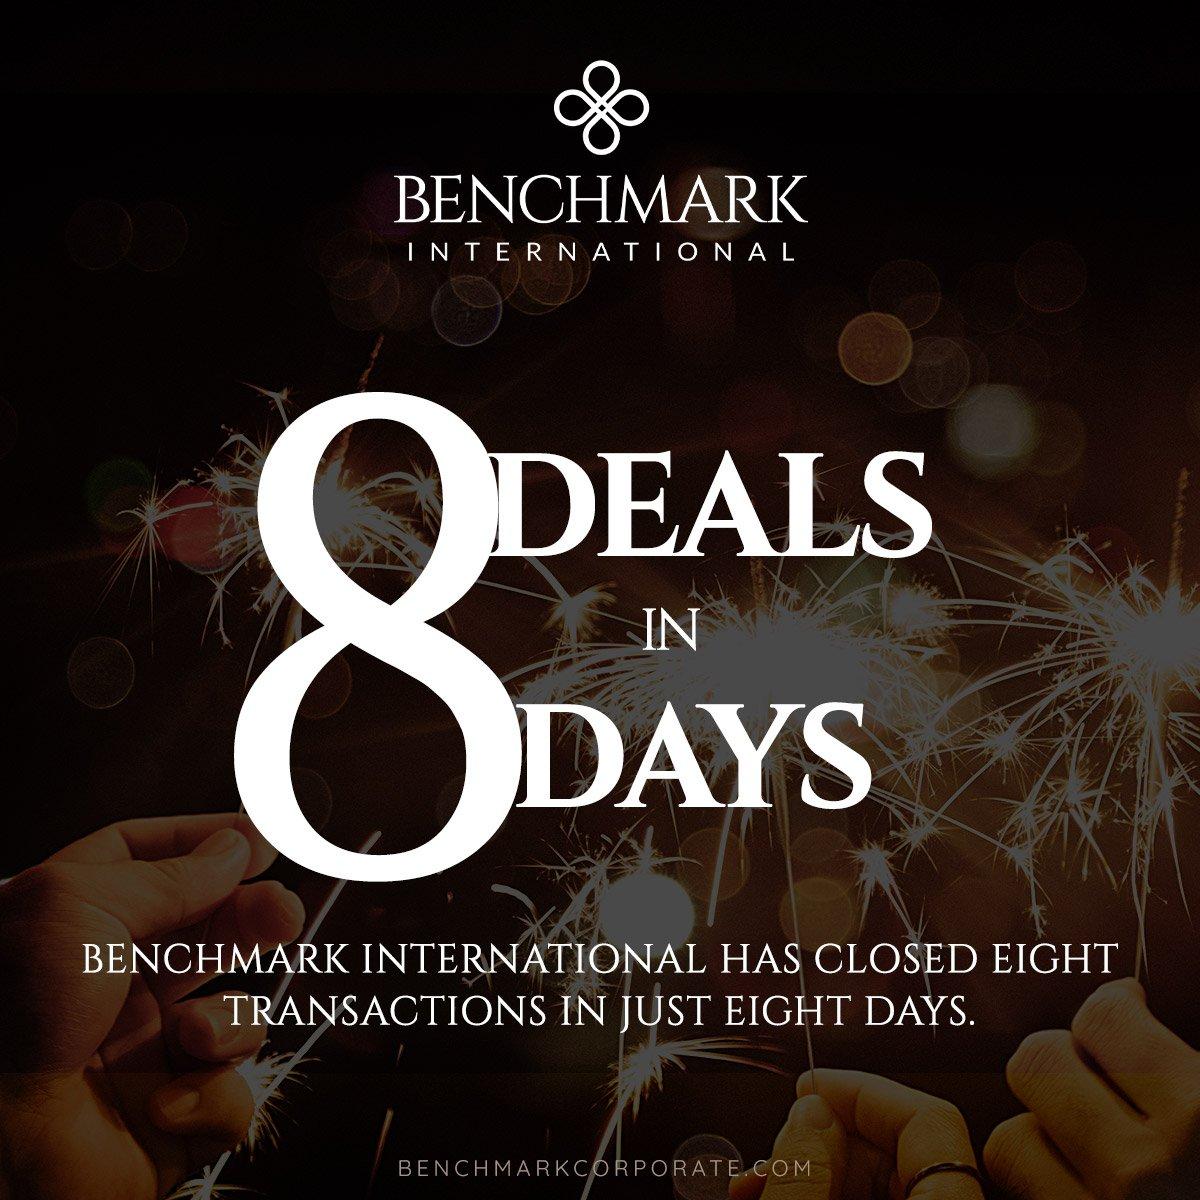 8_Deals_8_Days-Social-1